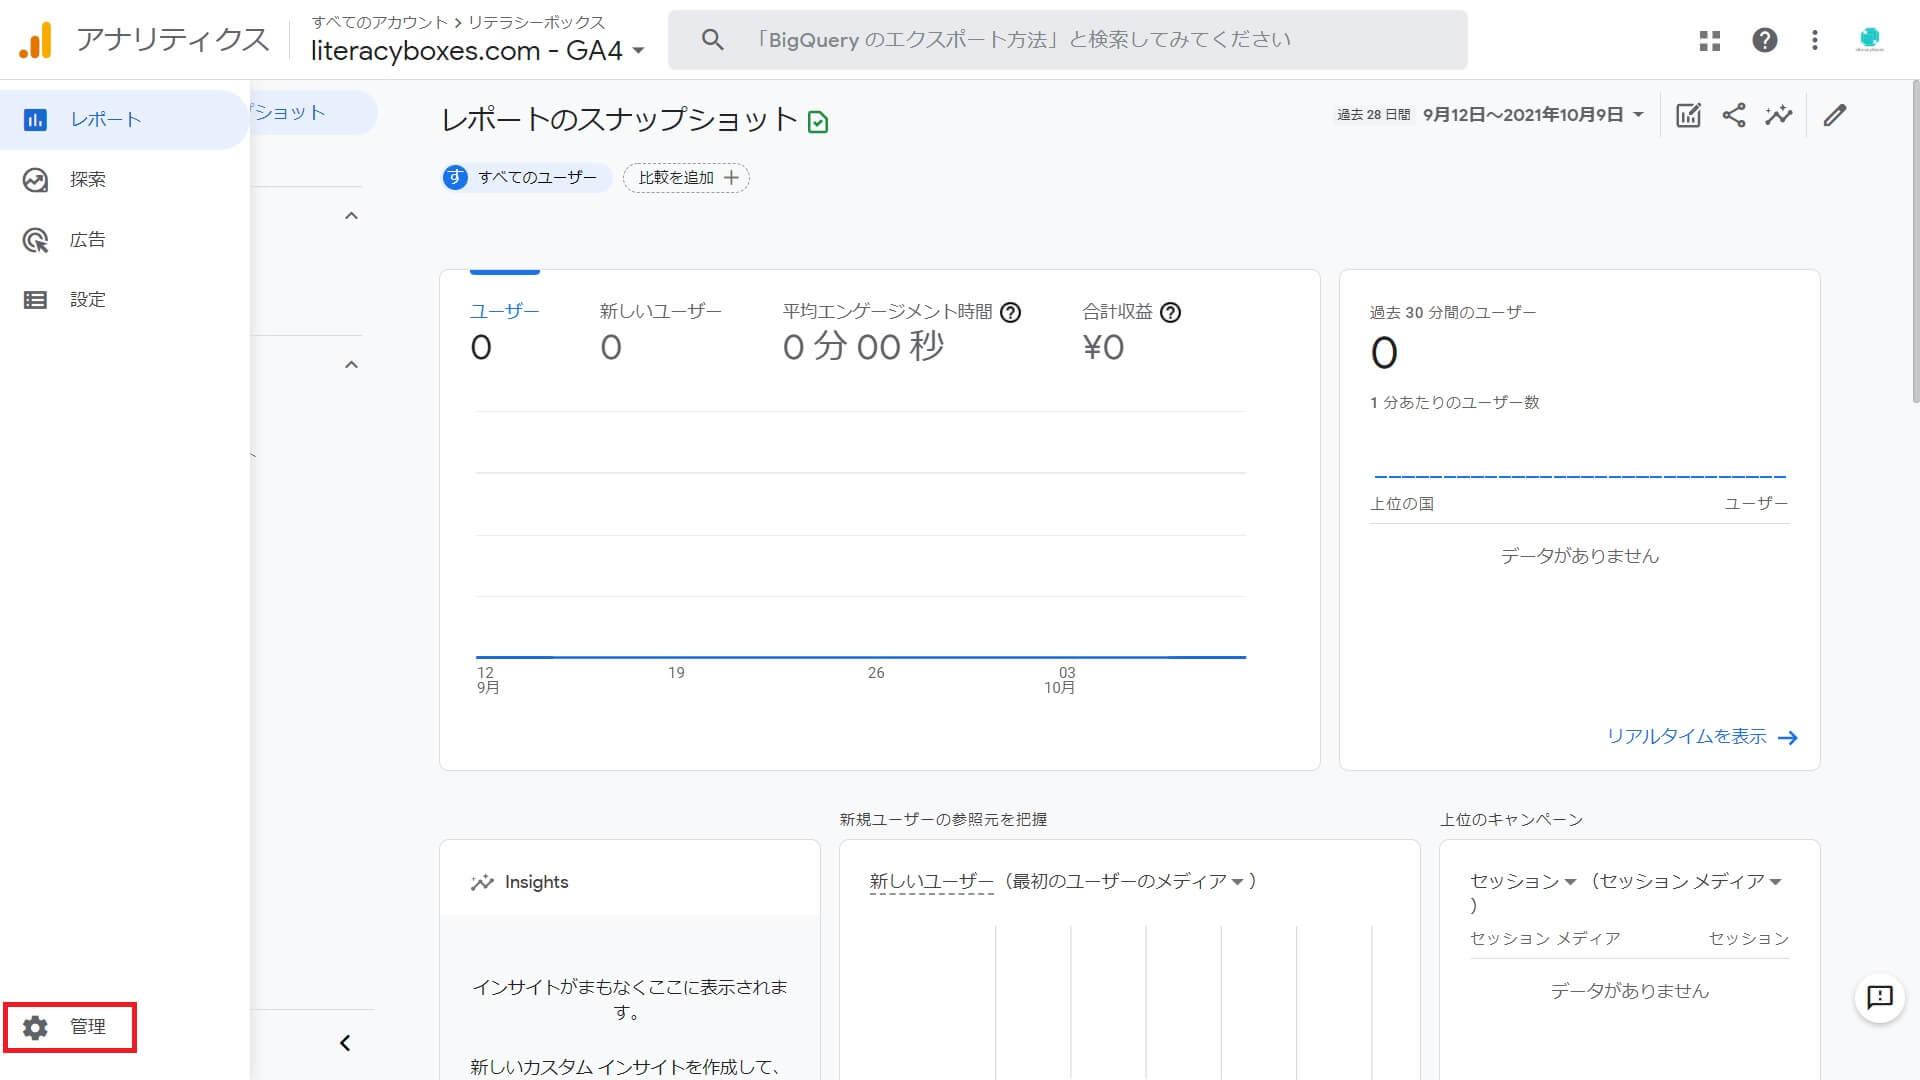 Googleアナリティクス-GA4管理画面